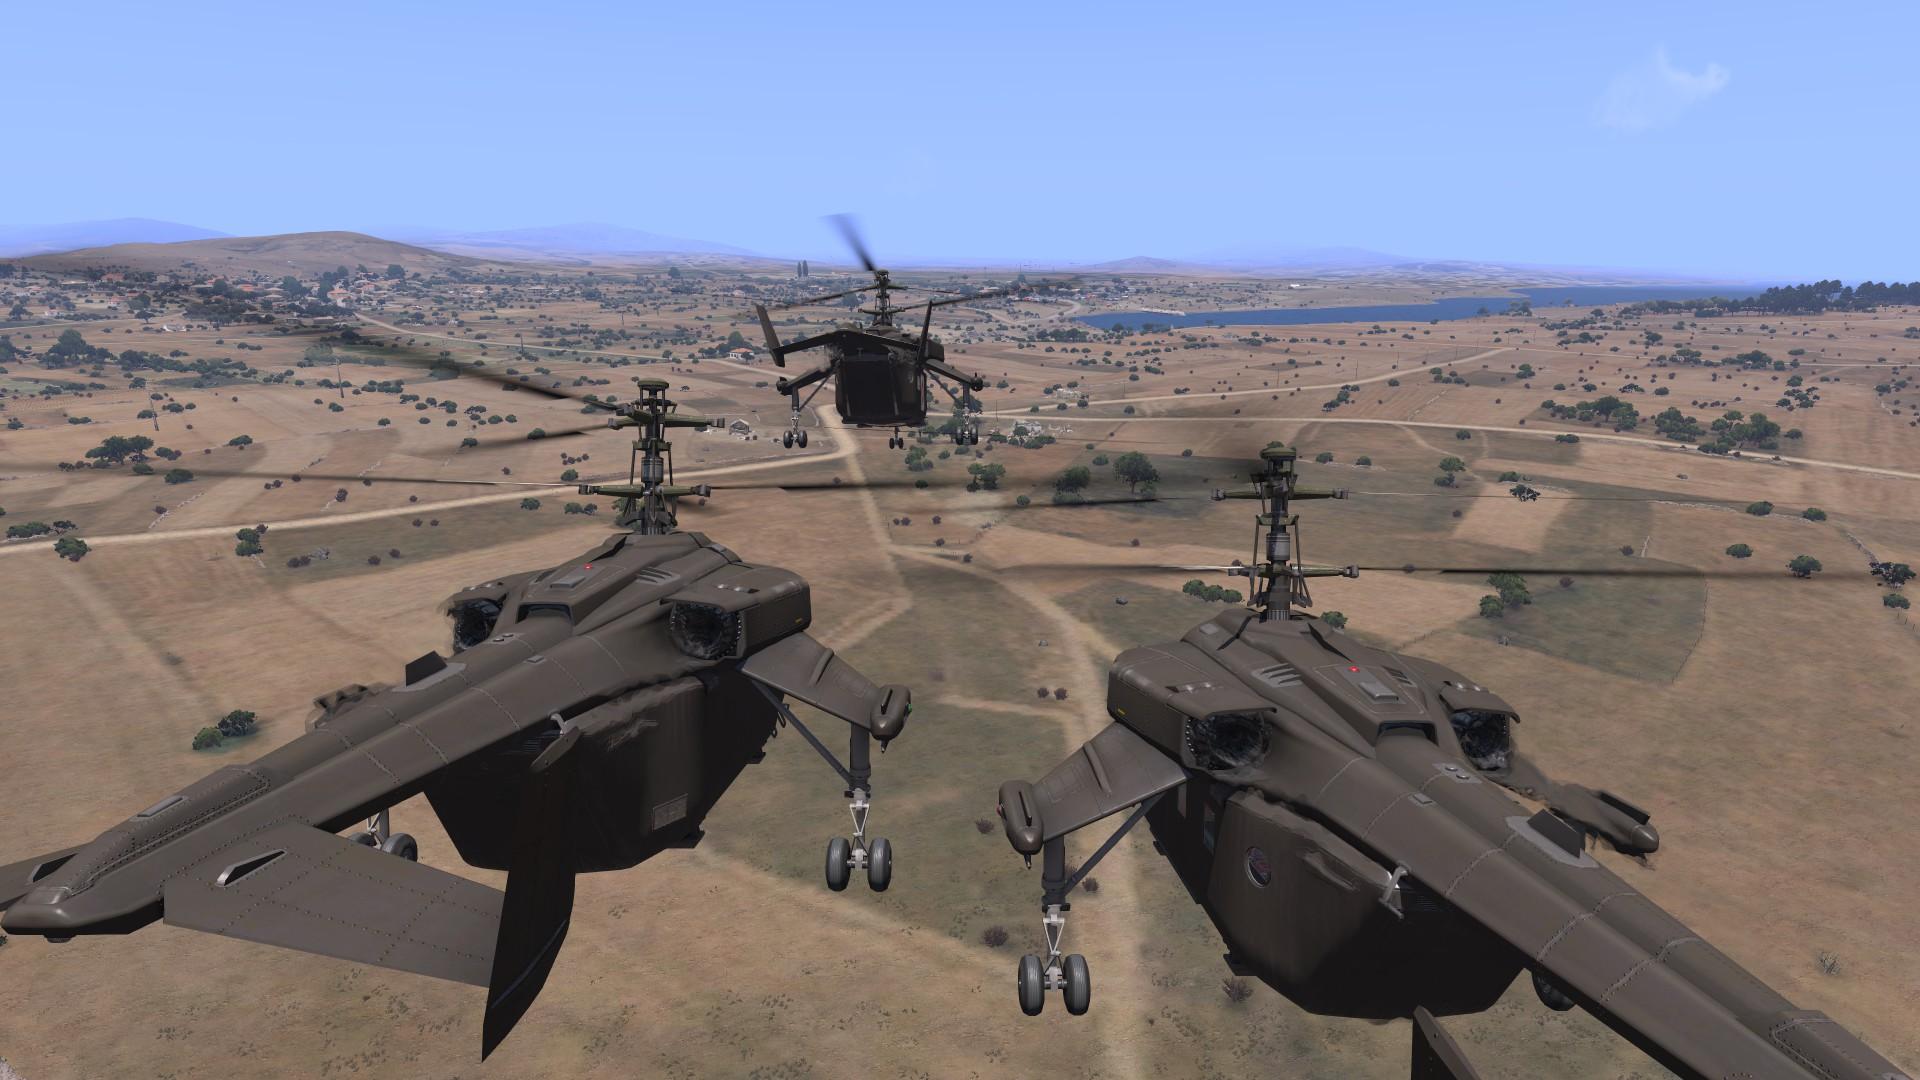 Arma 3 Elicottero : Jns skycranes nato taru helicopters von jonpas v